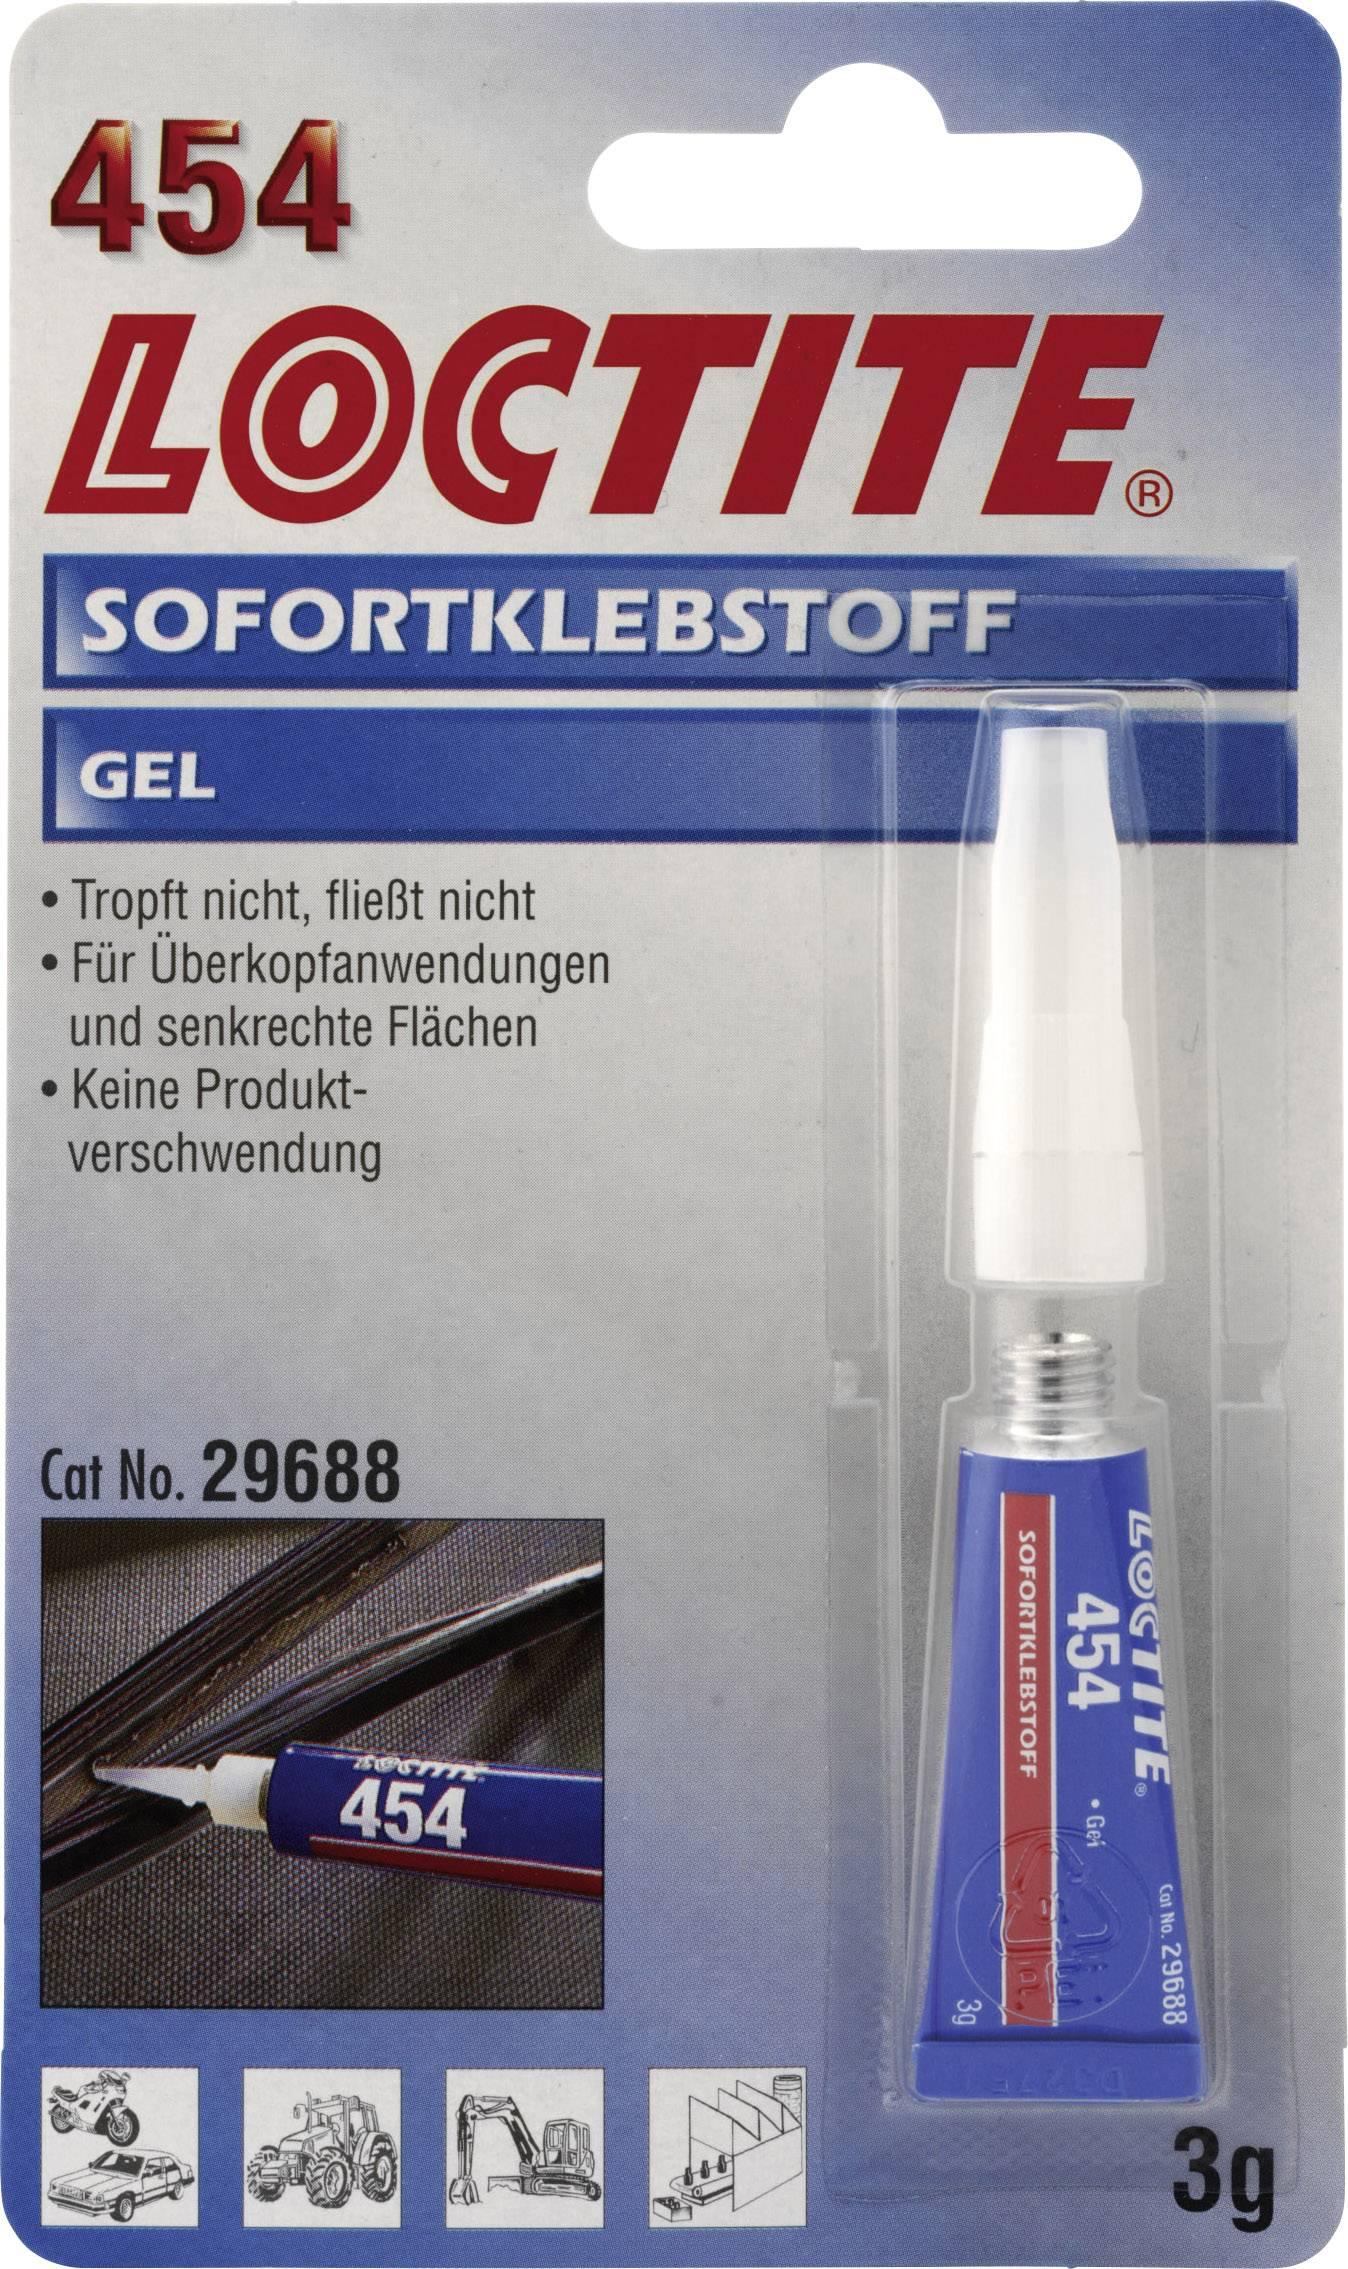 Sekundové lepidlo LOCTITE® 454;24703, 3 g